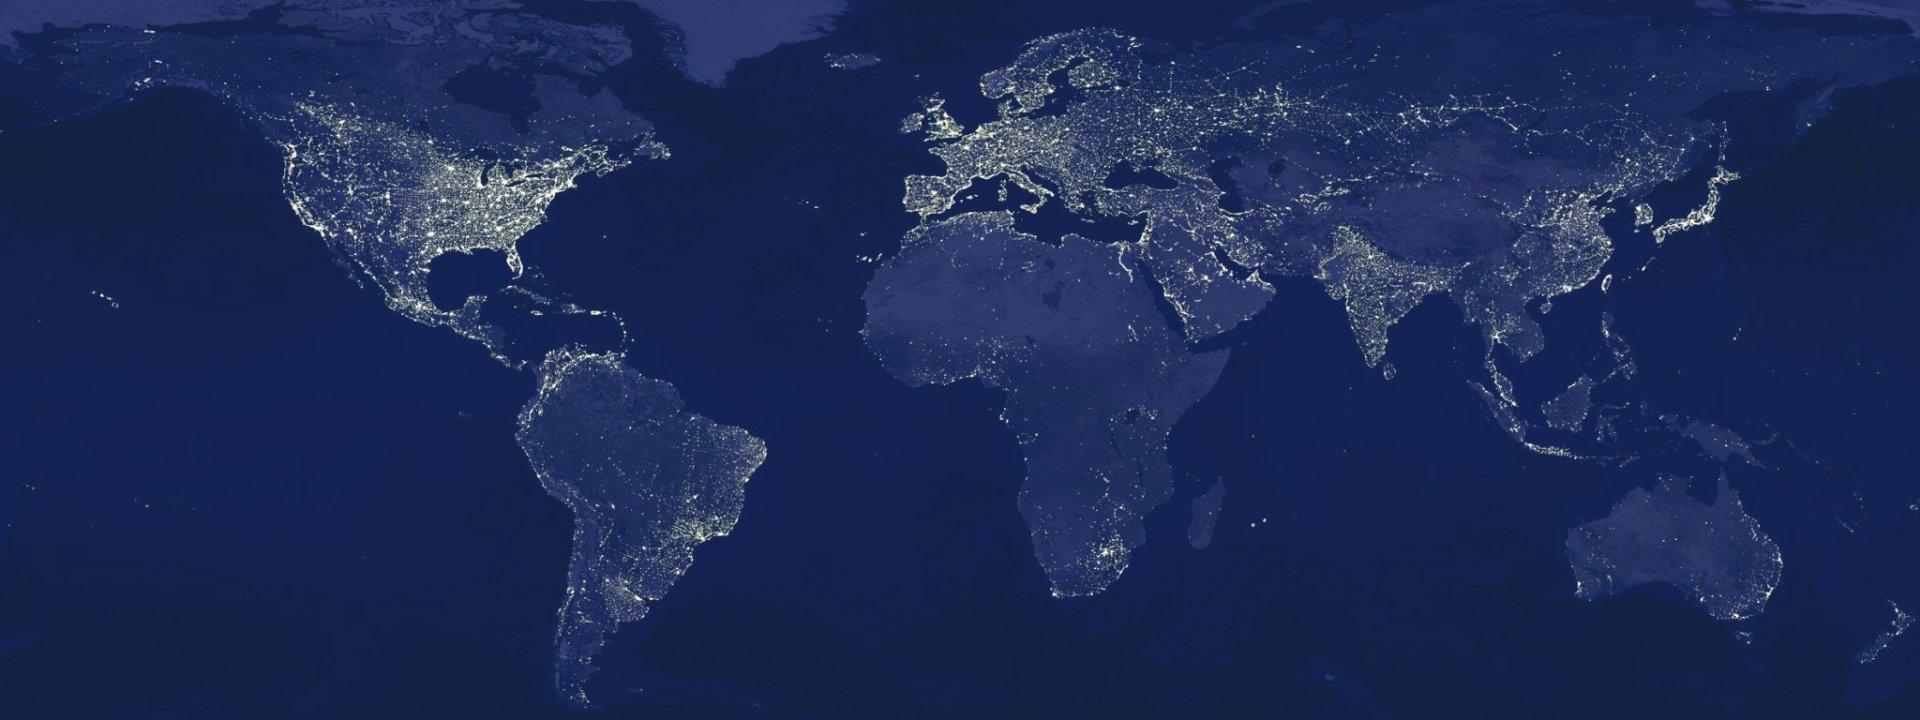 Multi Monitor - Erde/Natur  Karte Wallpaper